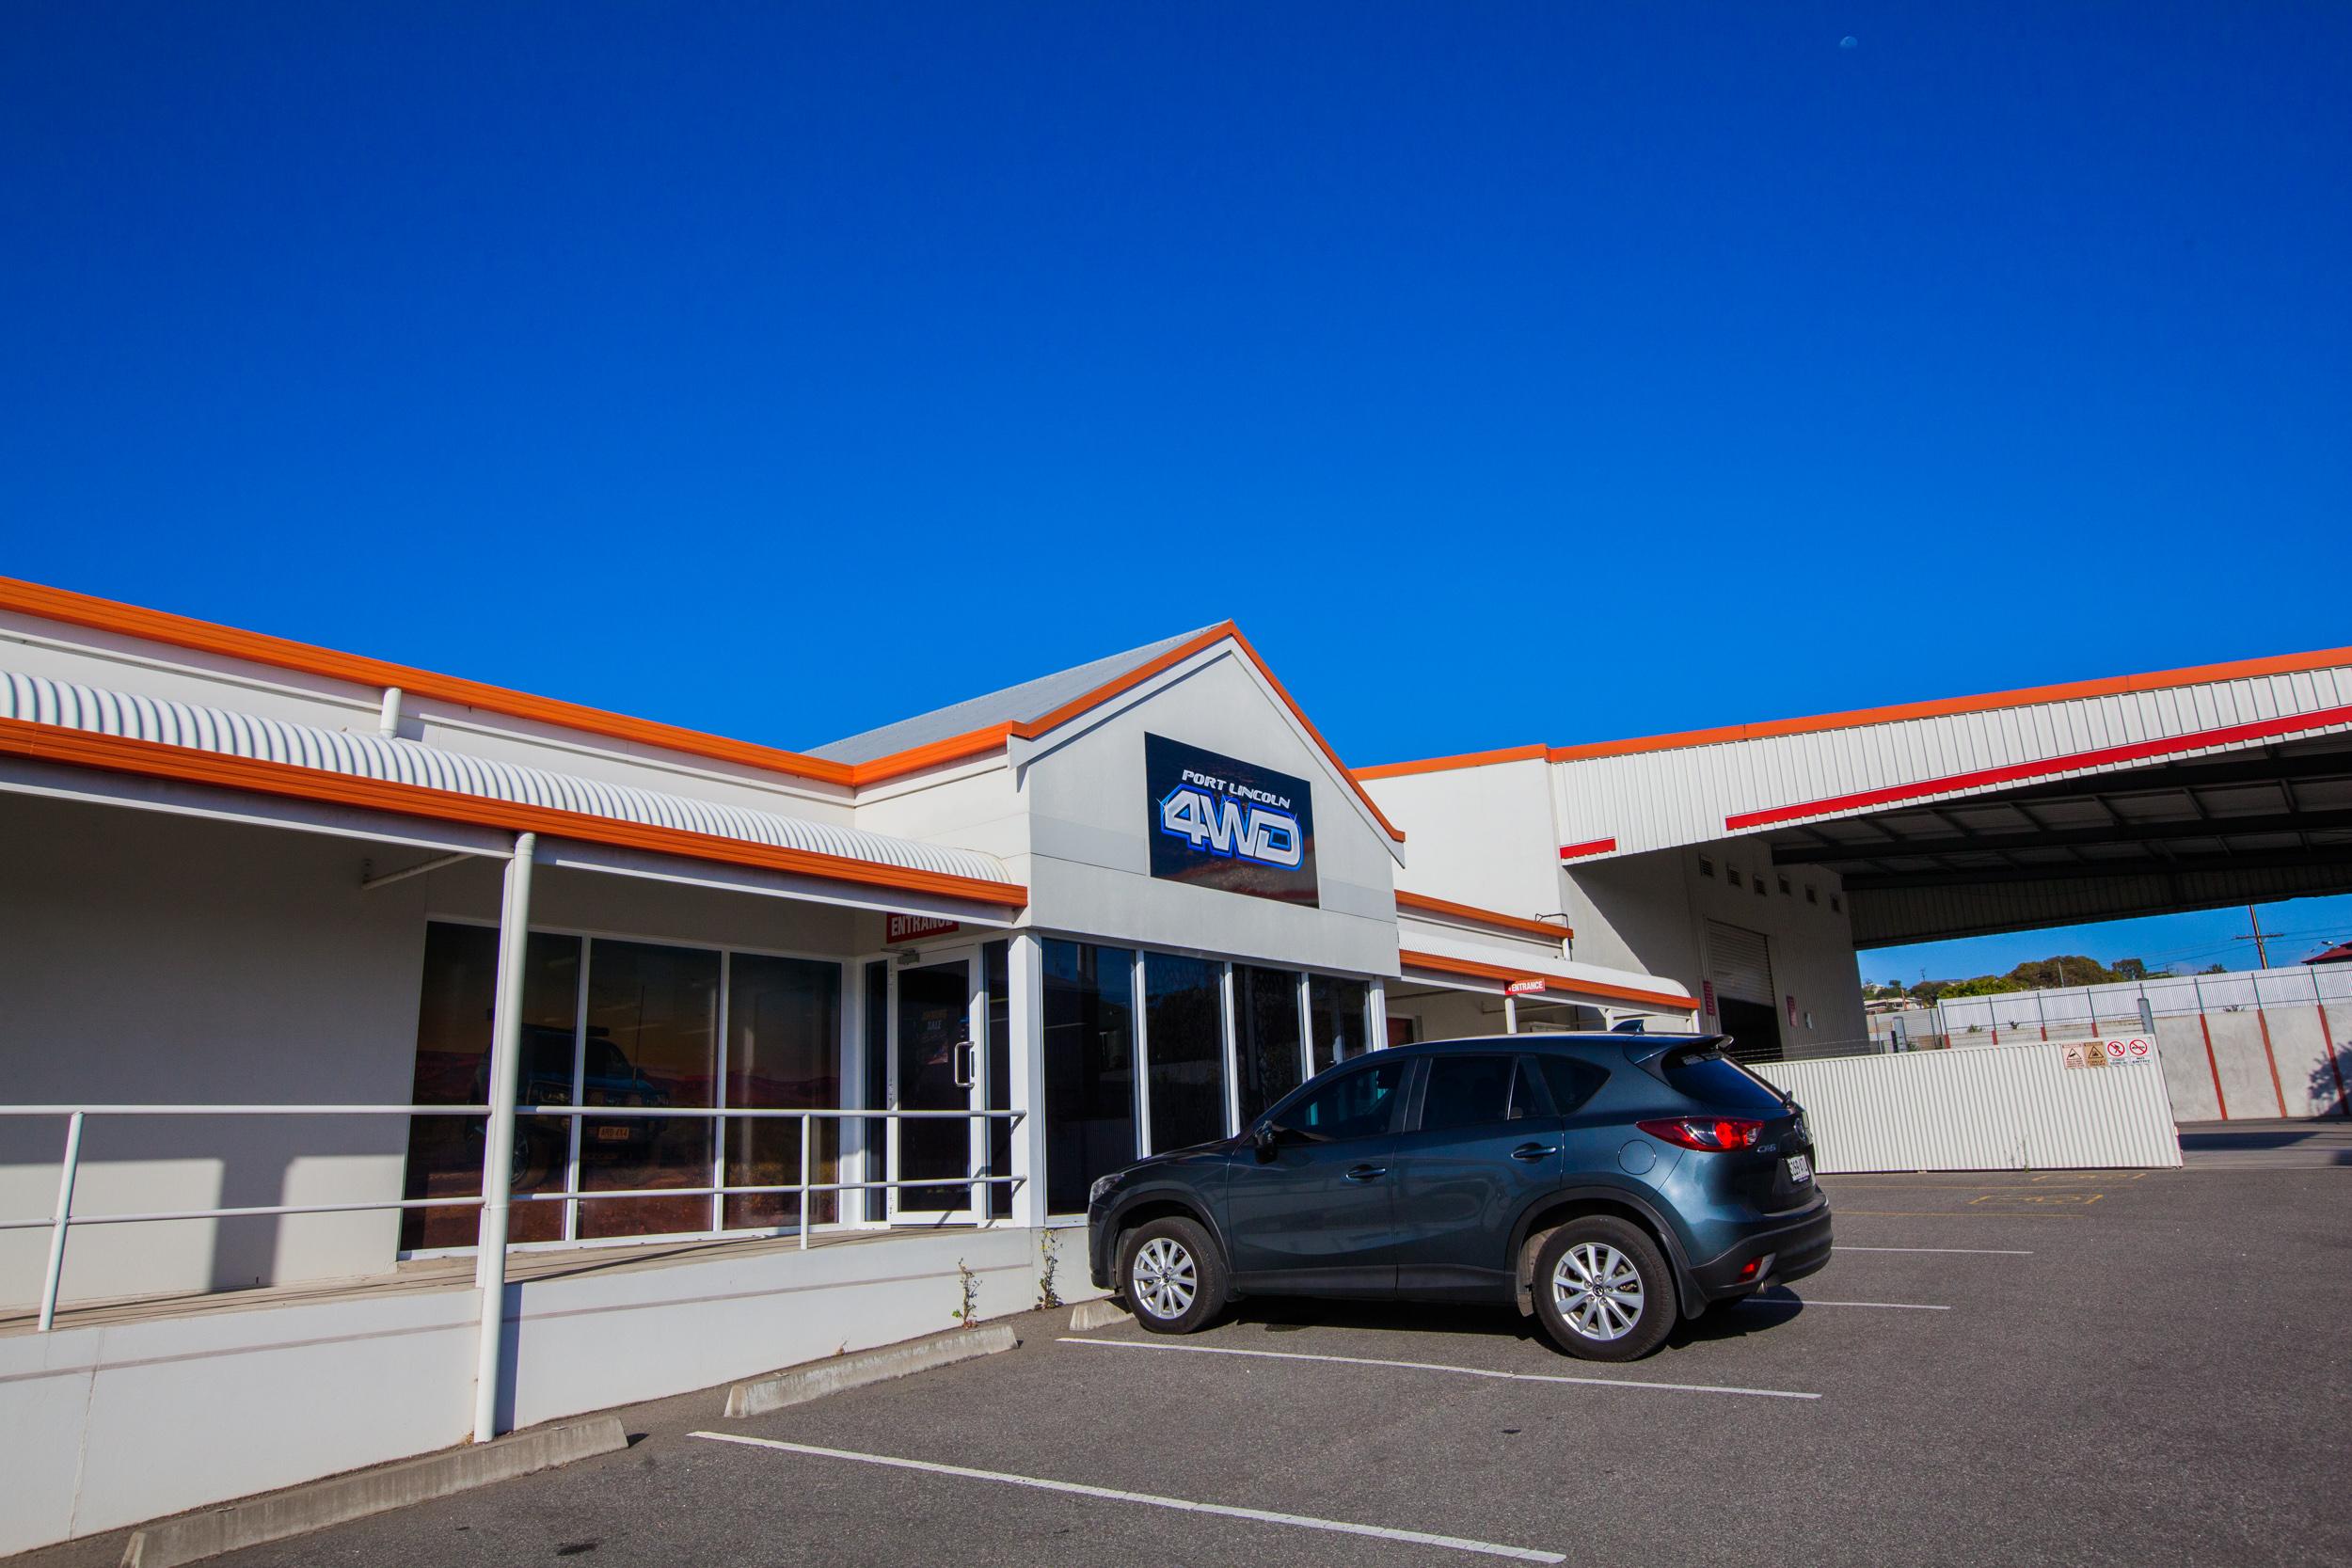 Port Lincoln 4WD - IMG_3445.jpg